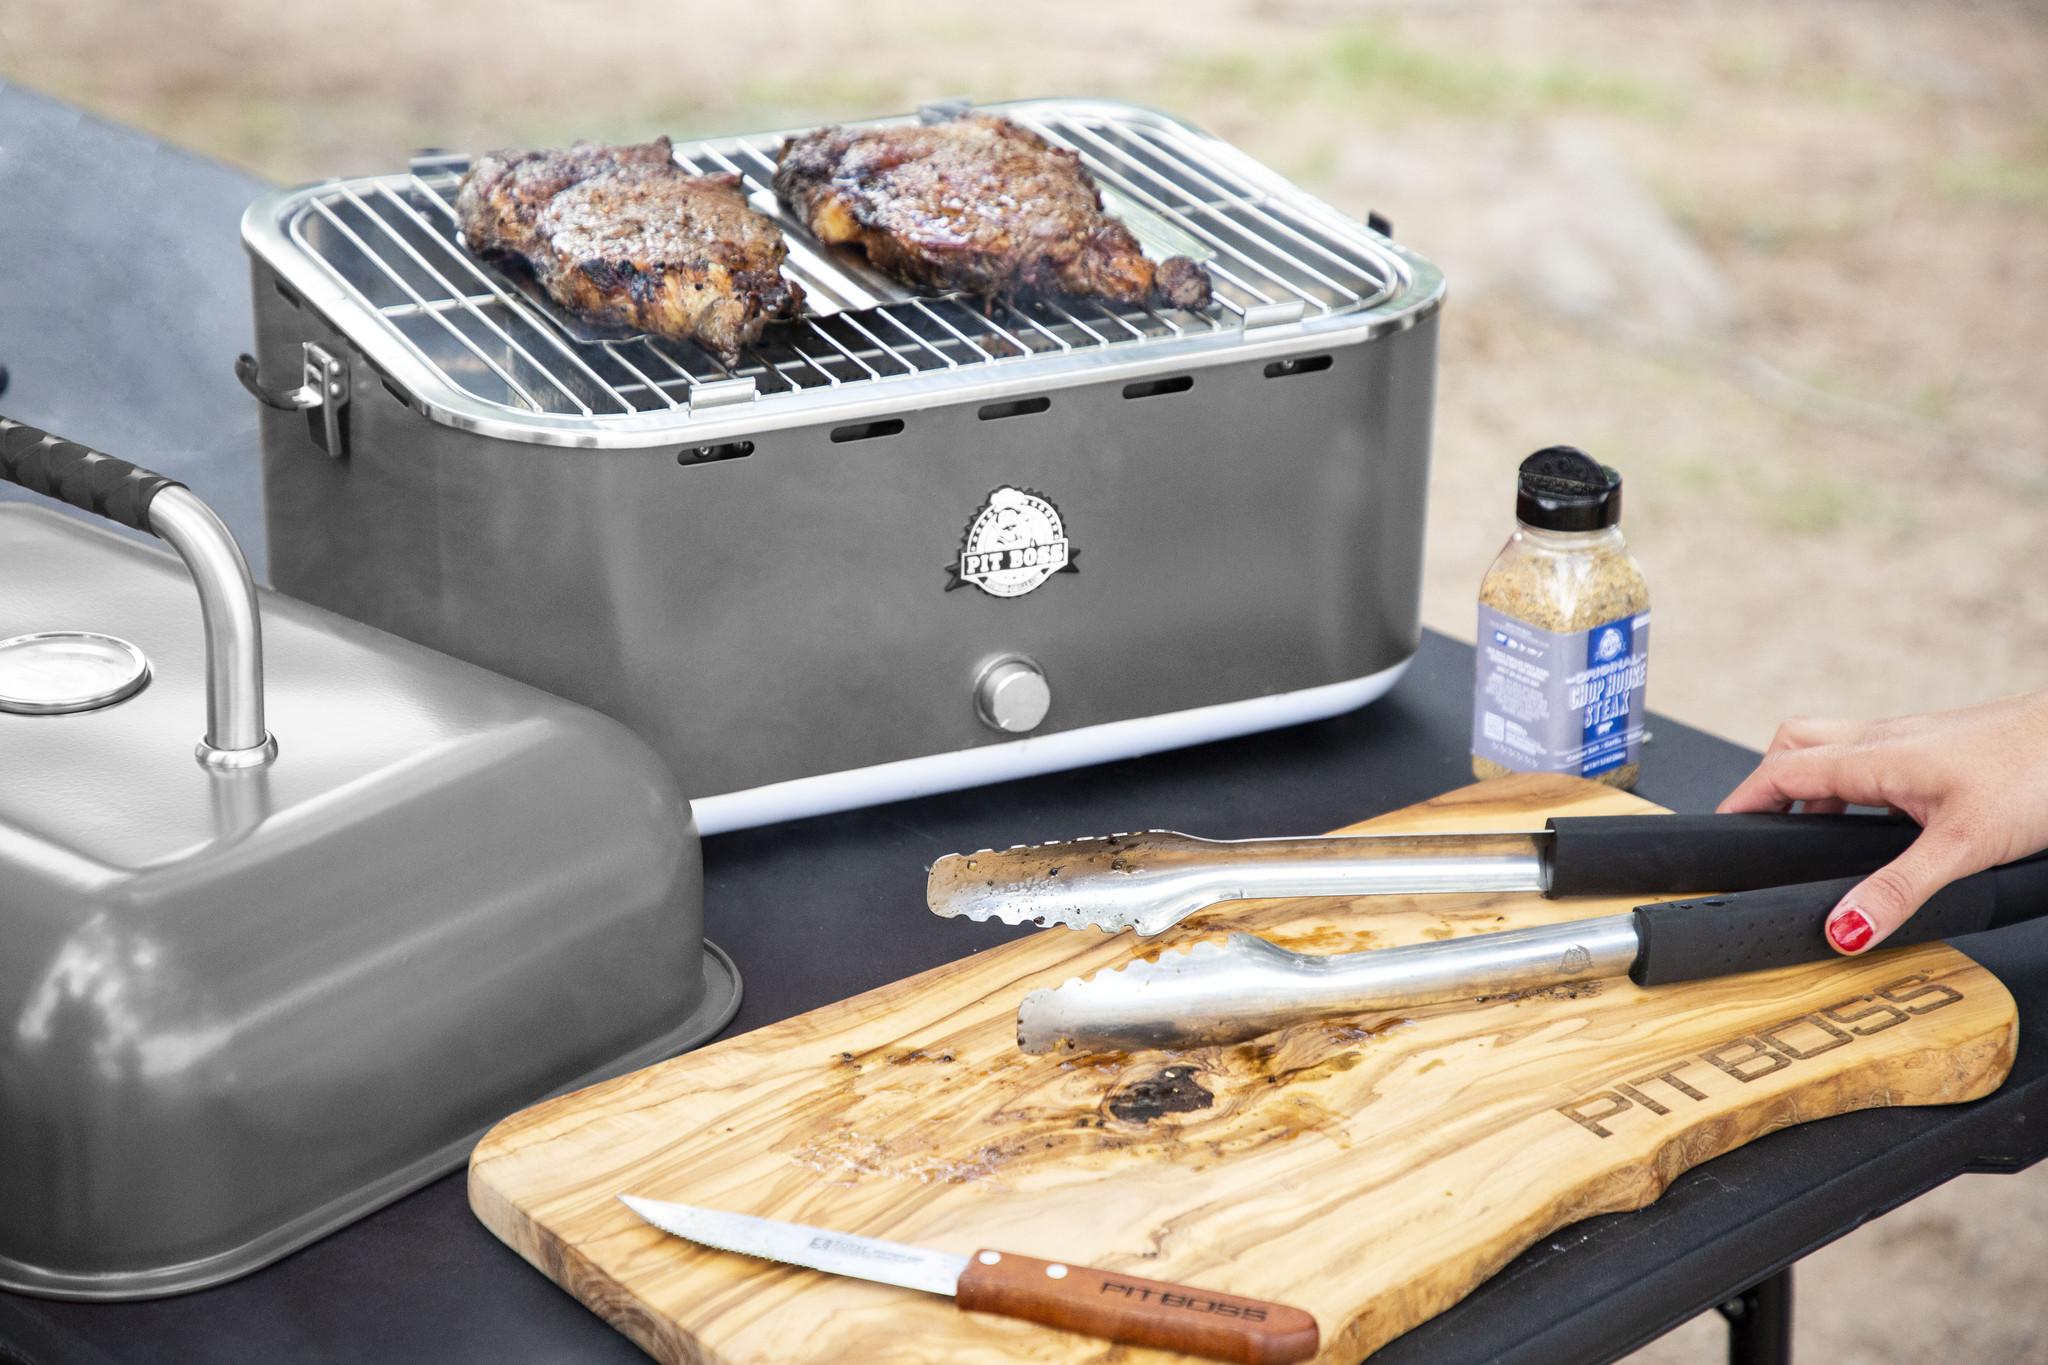 Meerbarbecue draagbare houtskool grill